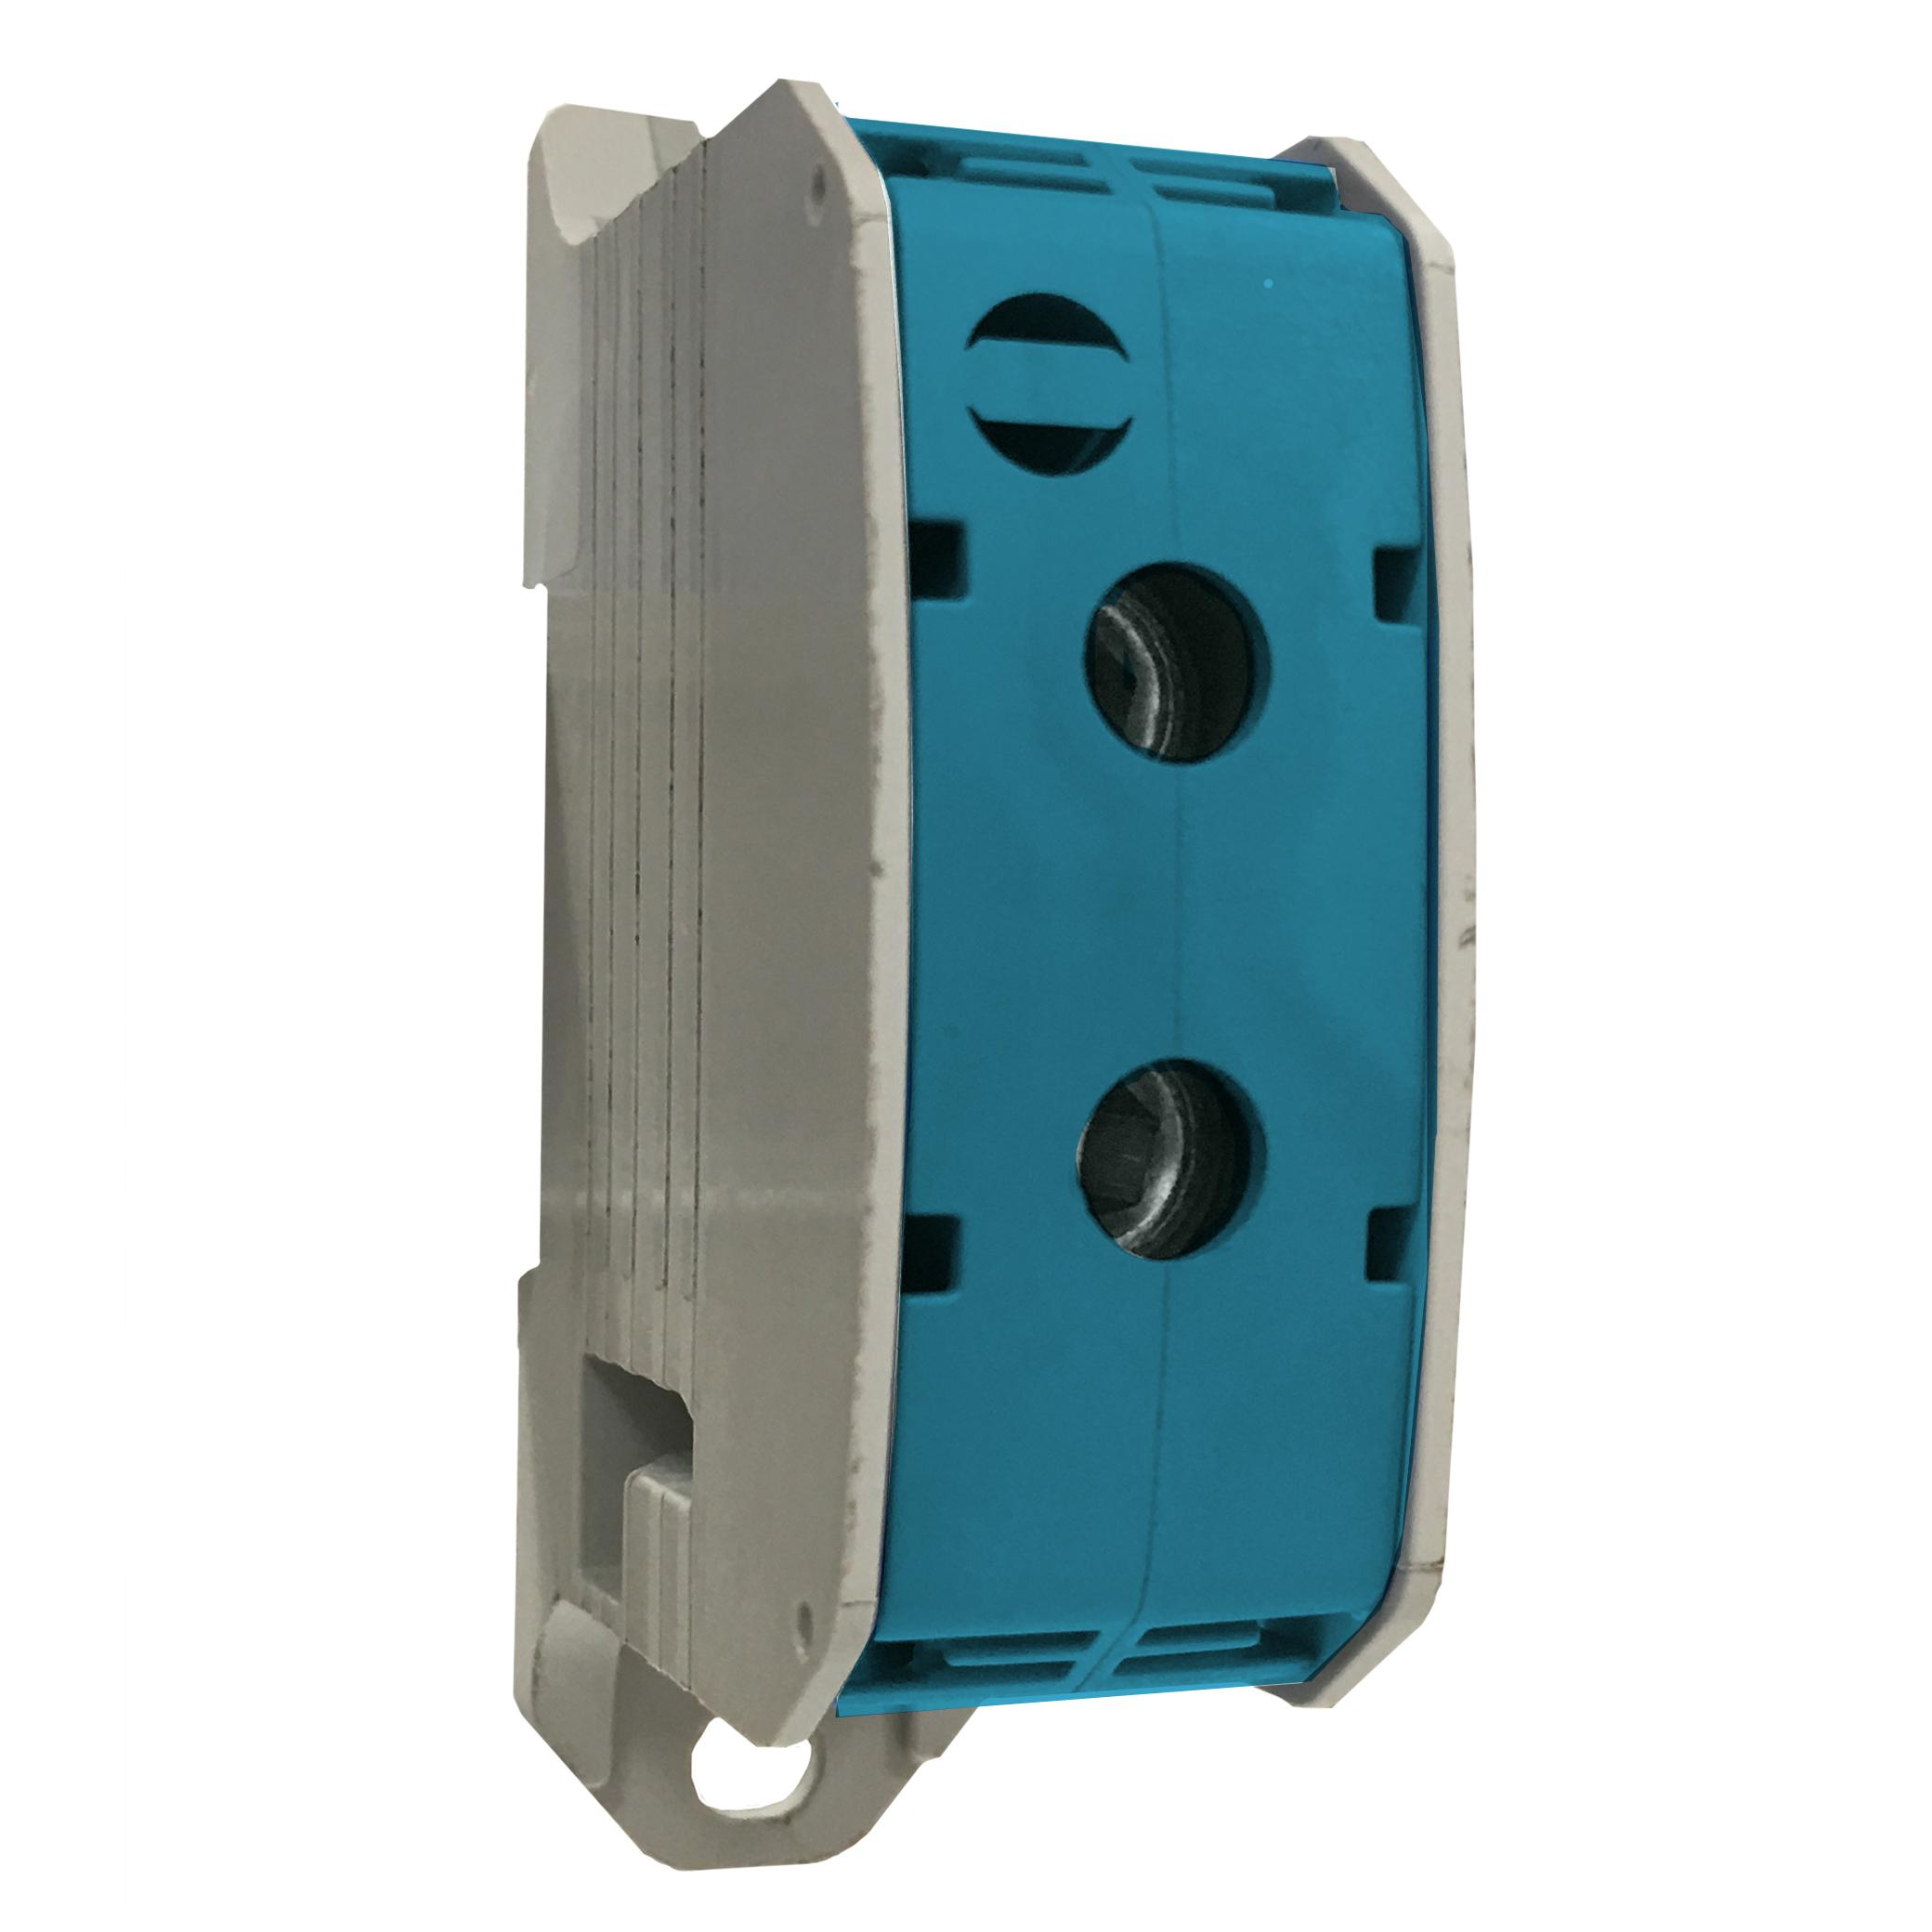 1 Stk Aluminium /Kupfer Klemme, 1-polig, 50mm² blau IKA21320--